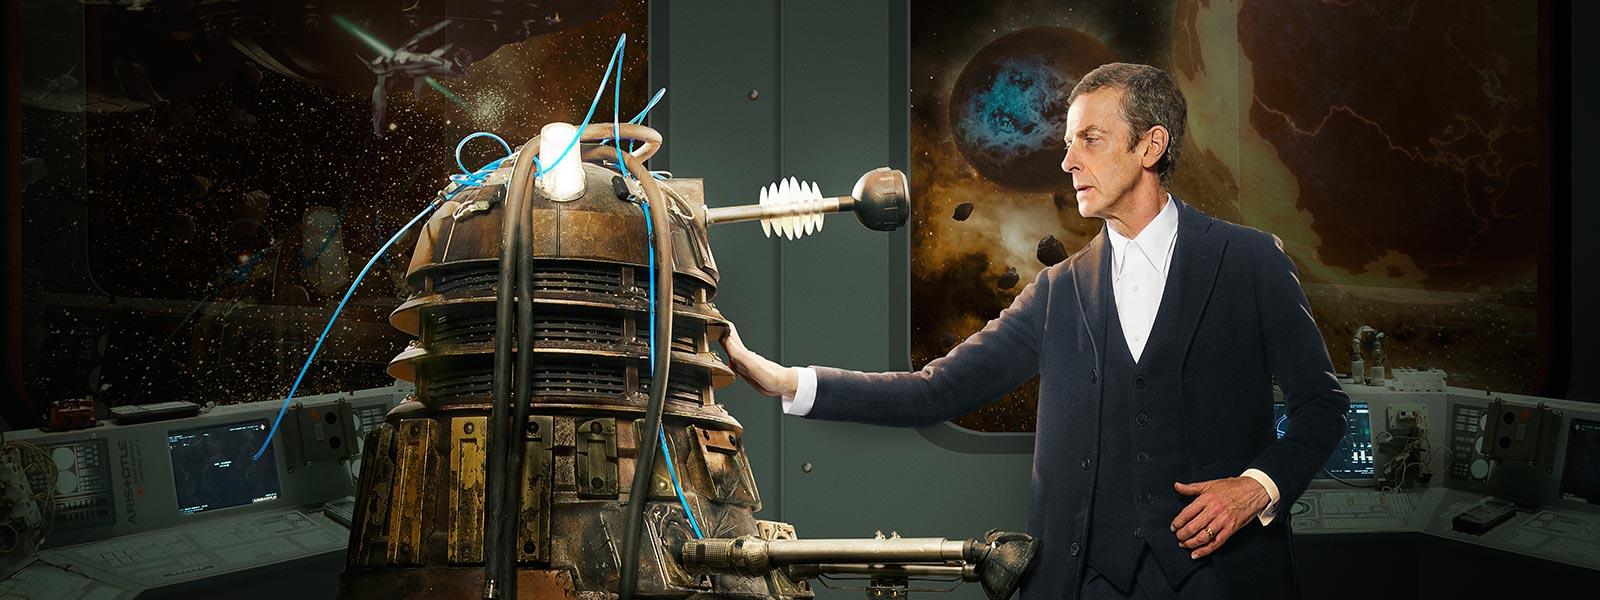 doctor-who-episode-802-doctor-capaldi-800×600